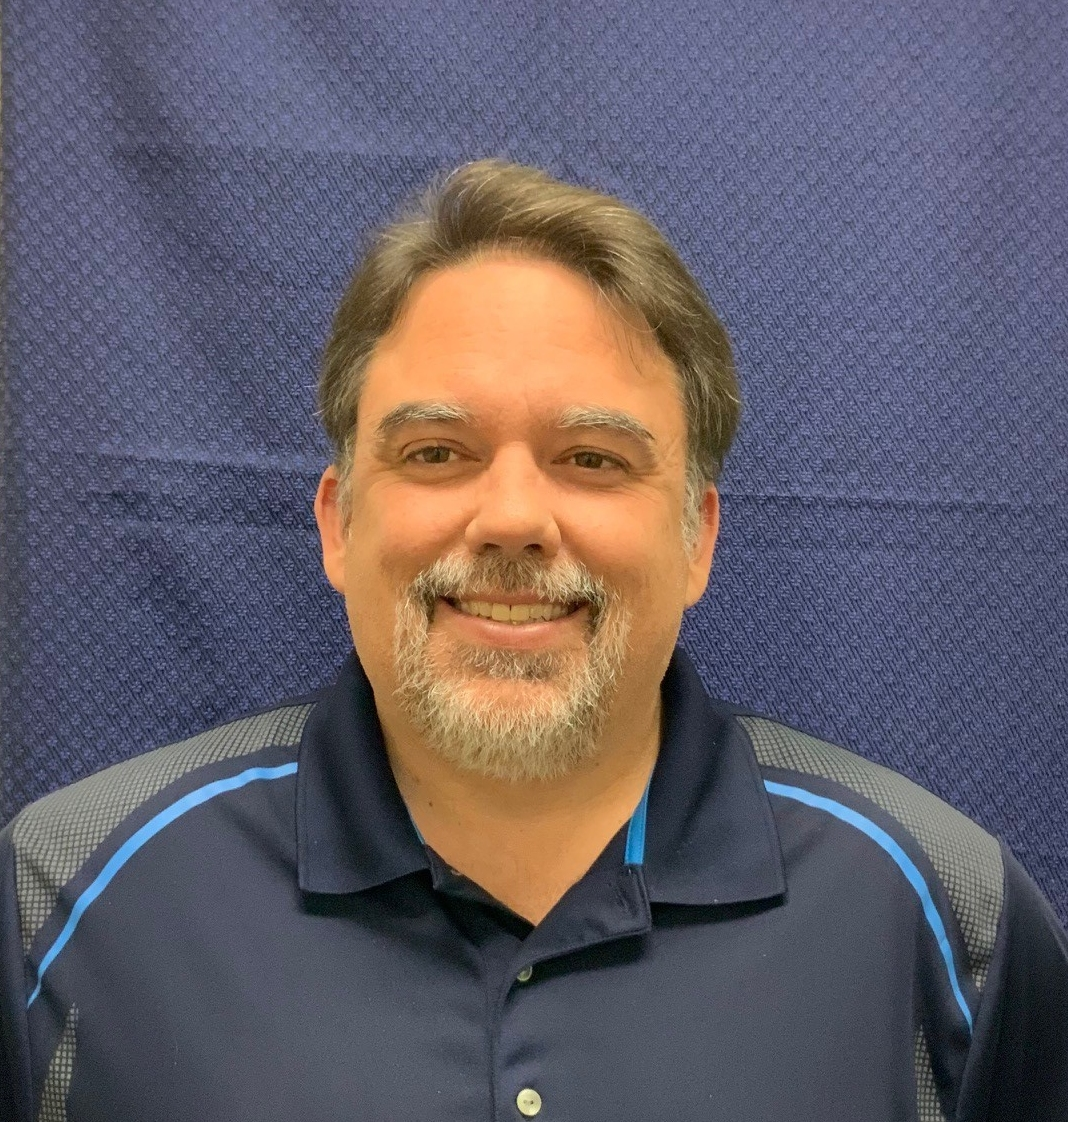 COSTHA Senior Technical Consultant Tom Ferguson